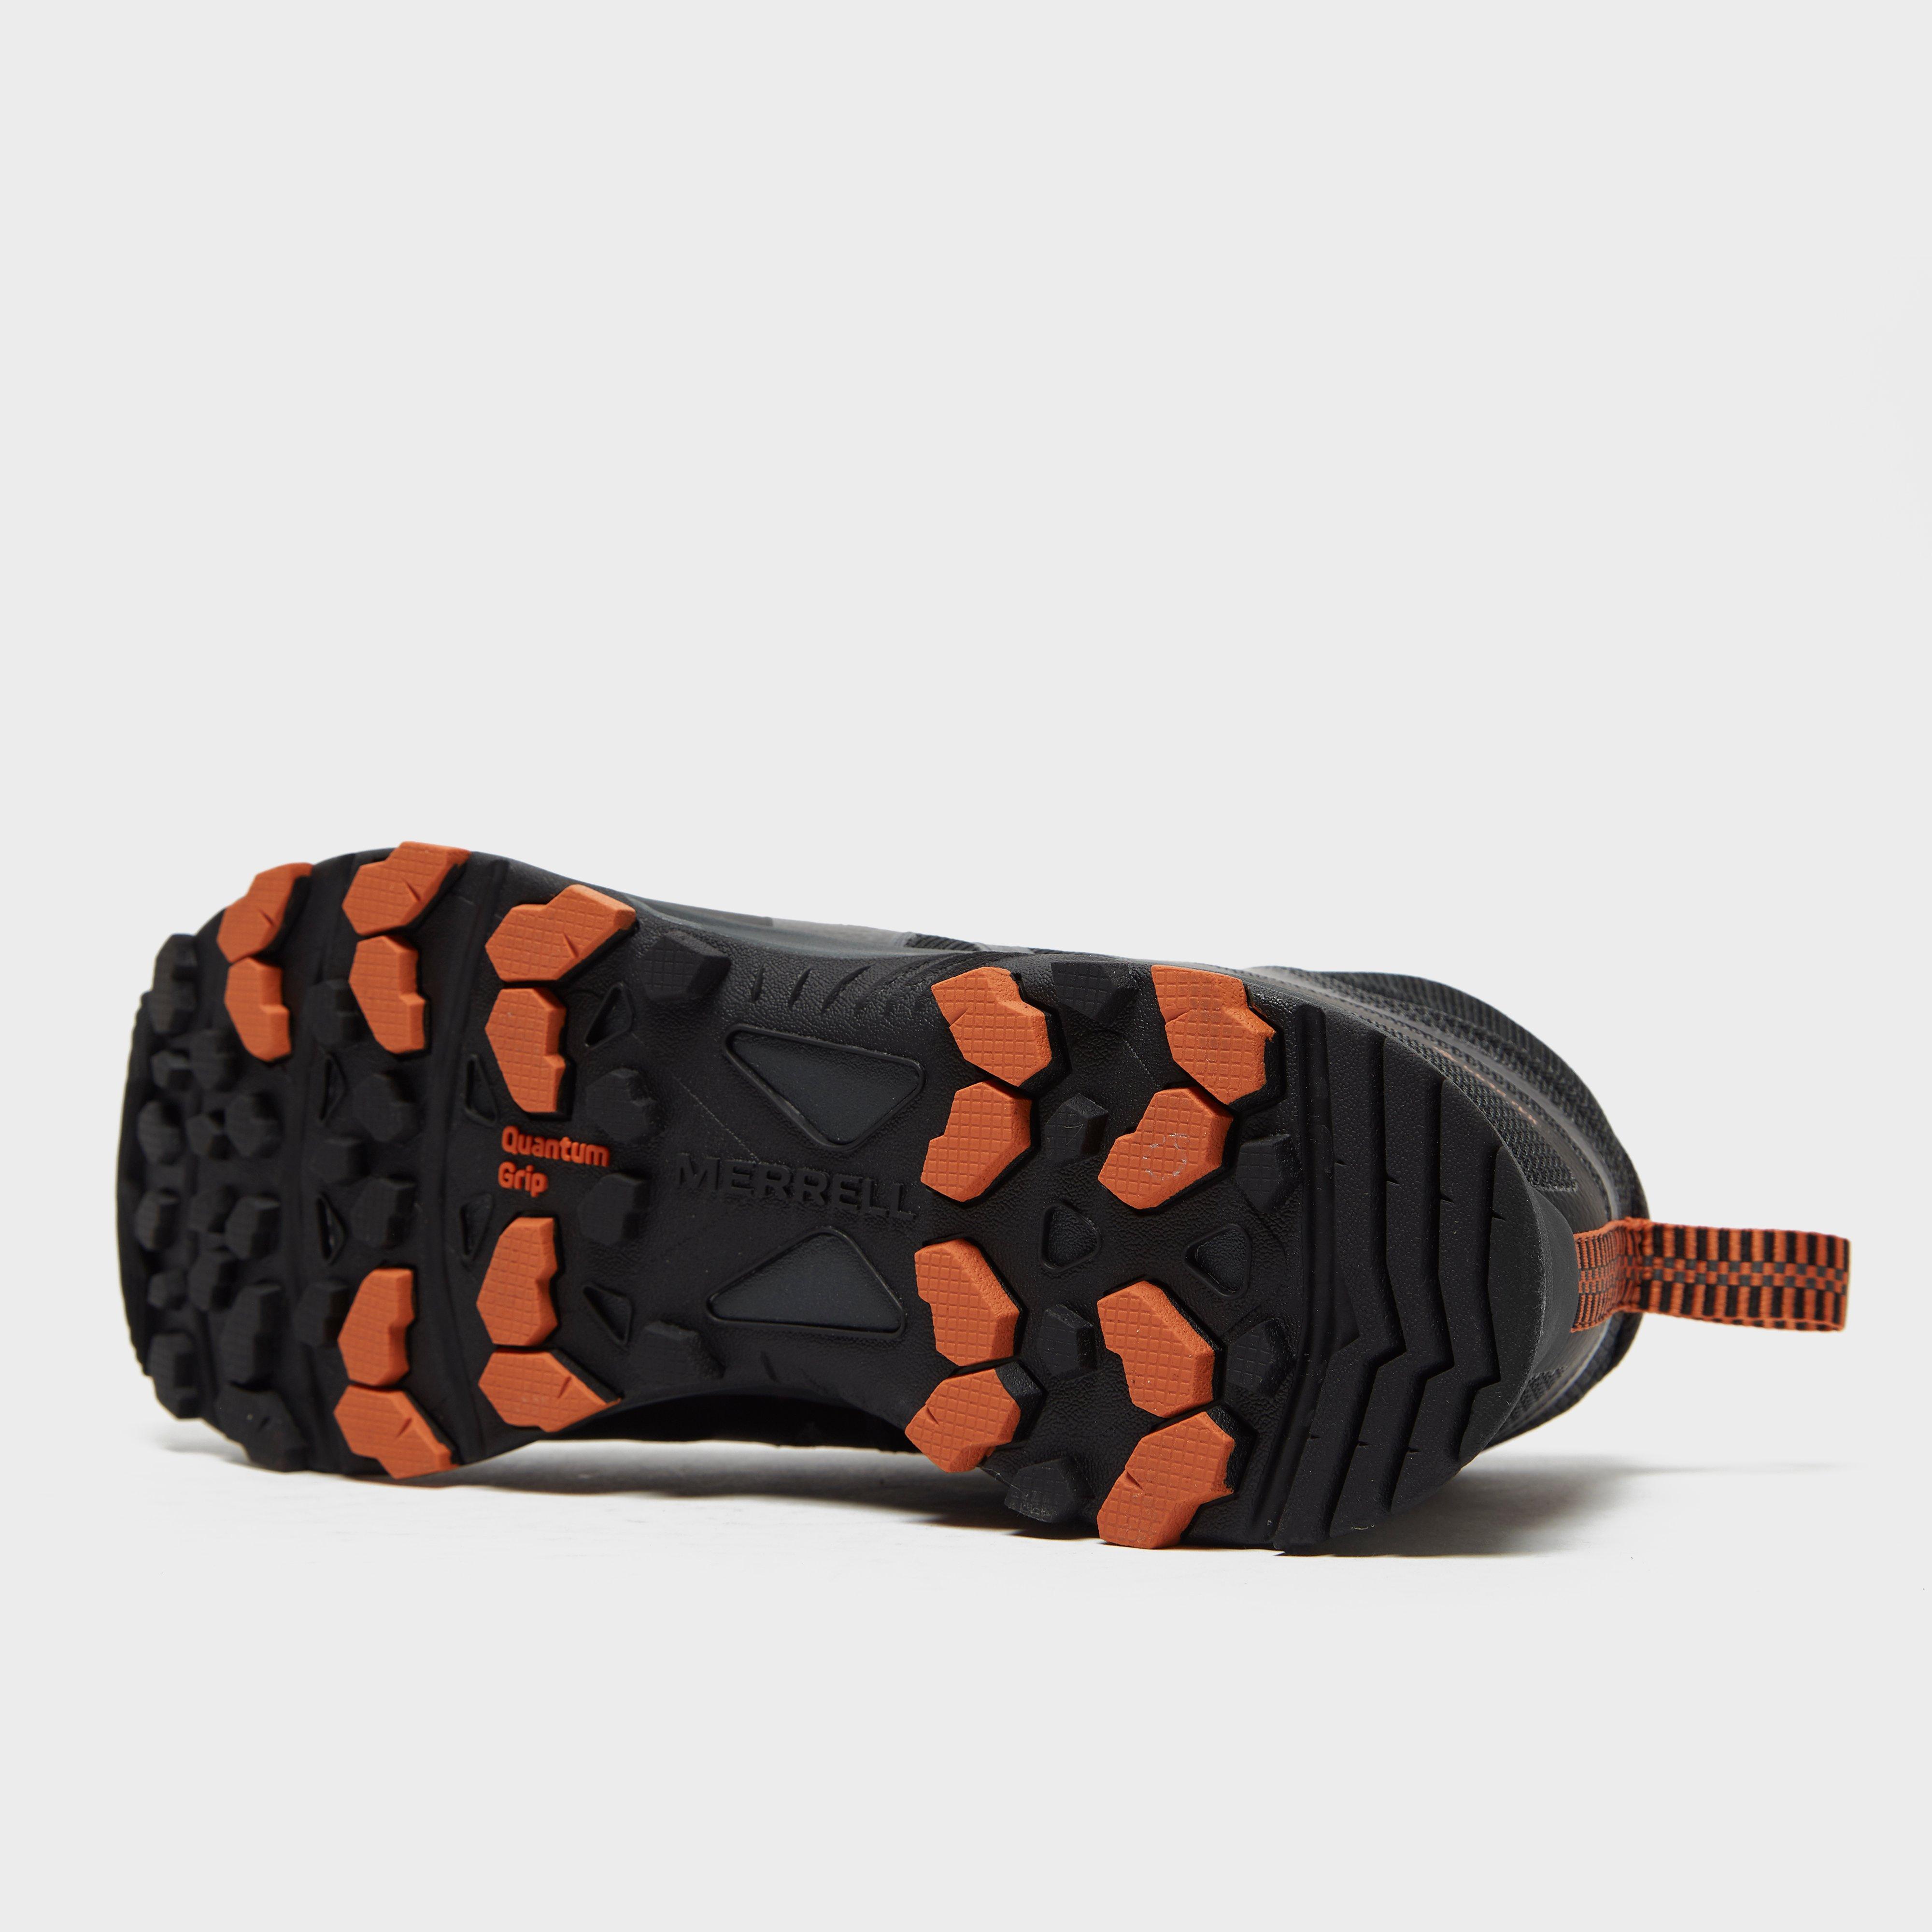 New Peter Storm Men's Arnside Vent Lightweight Walking Shoes